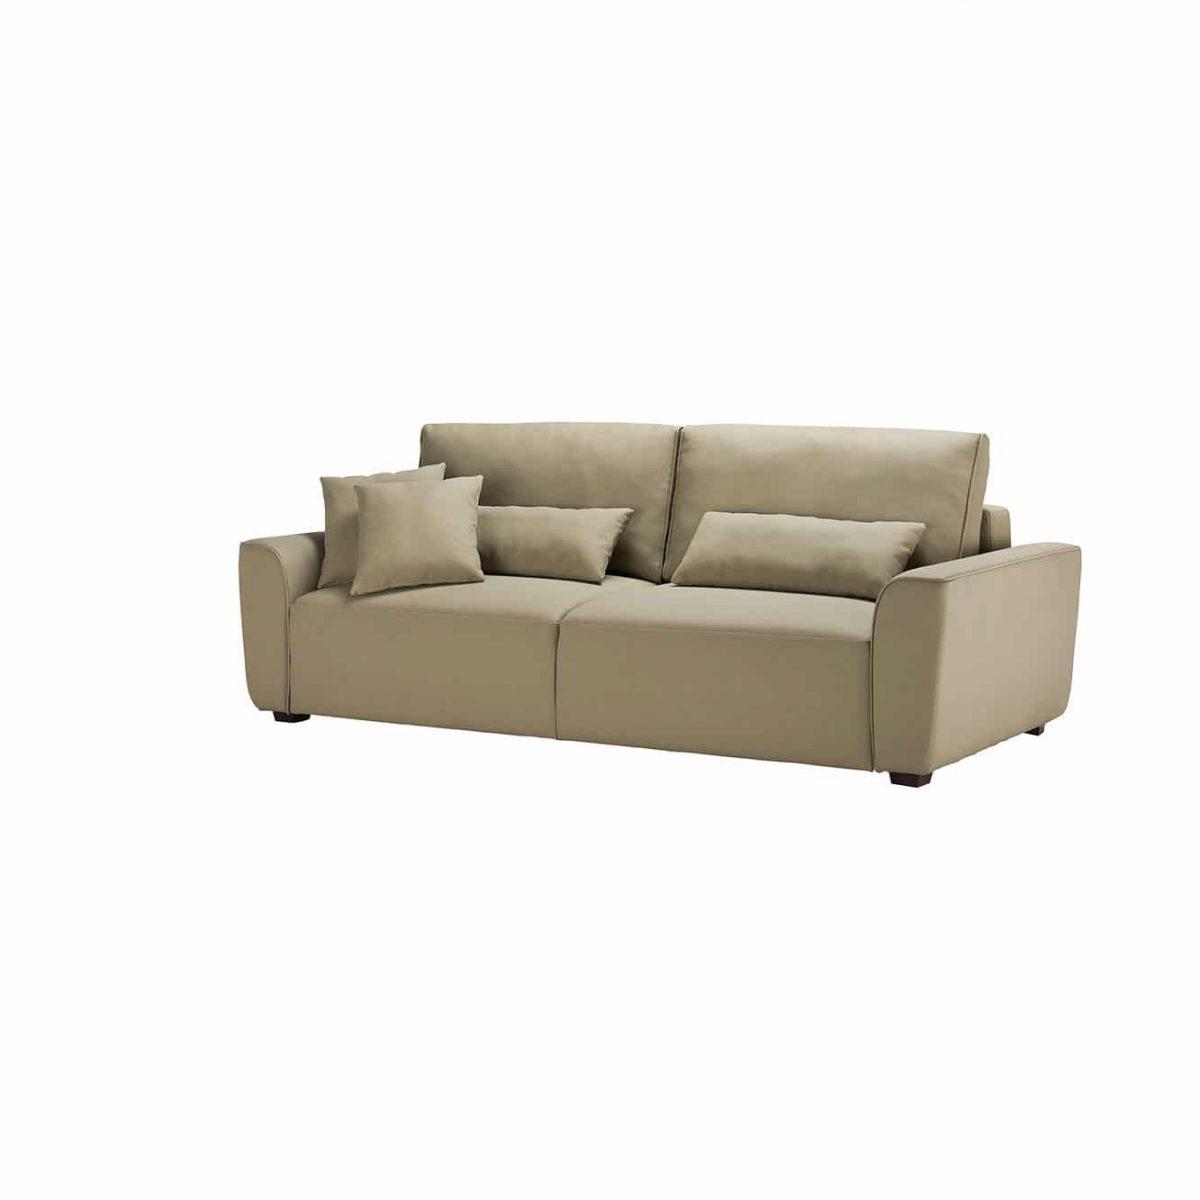 Cloud   Modern Queen Sofa Bed Sleeper   Expand Furniture